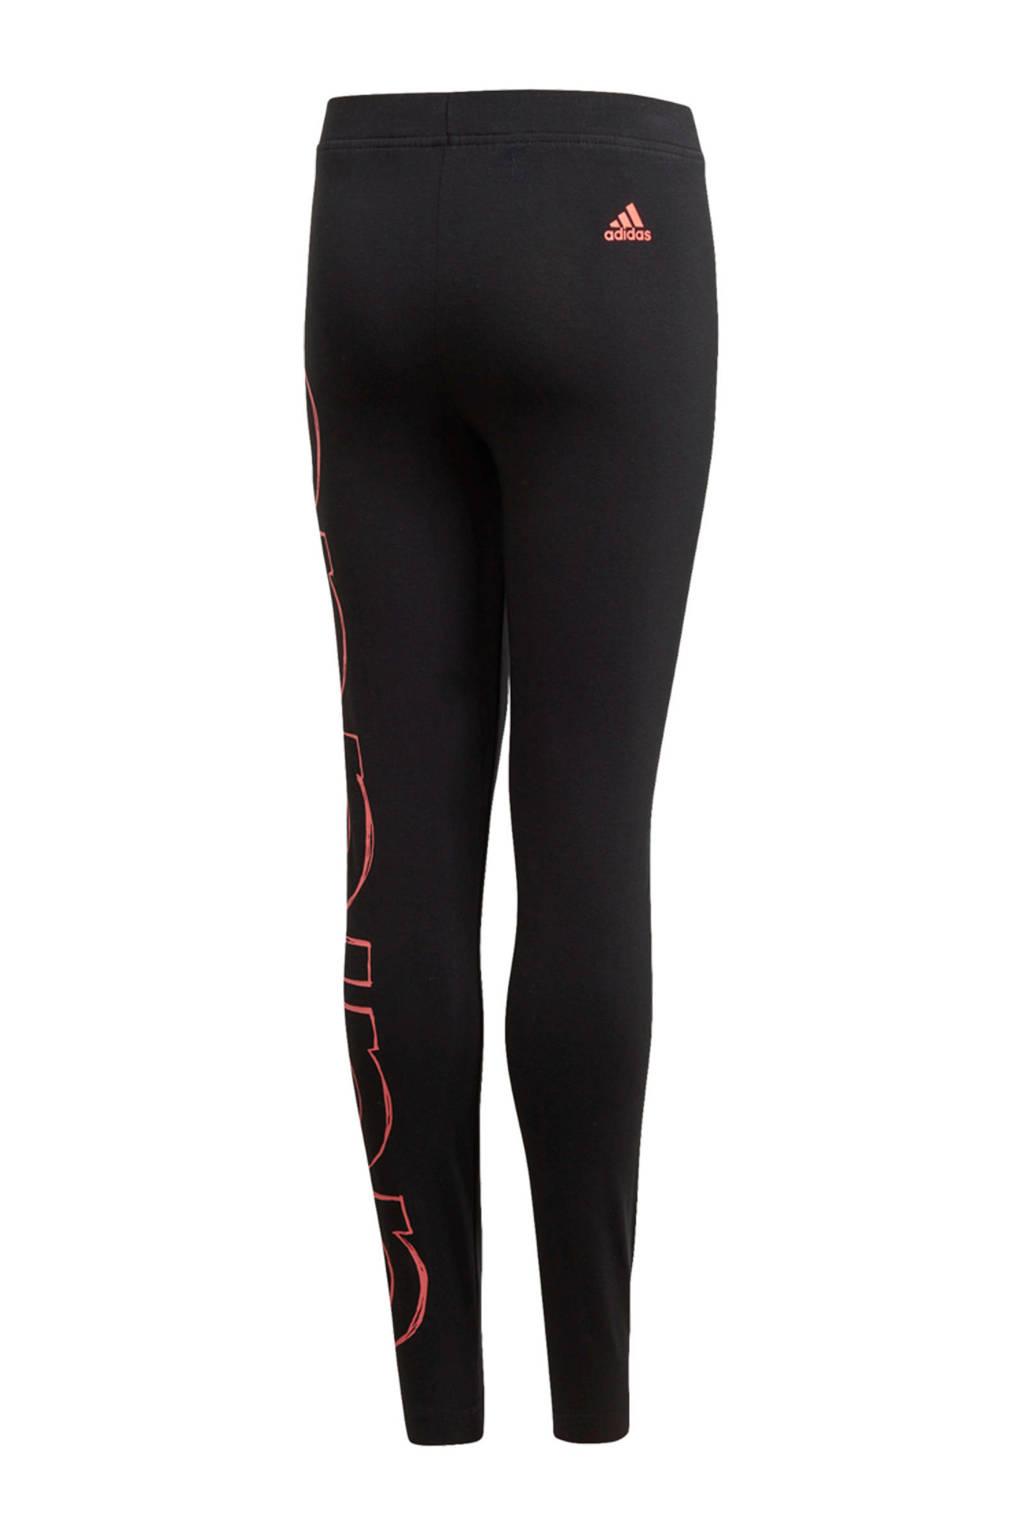 adidas Performance sportbroek zwart/roze, Zwart